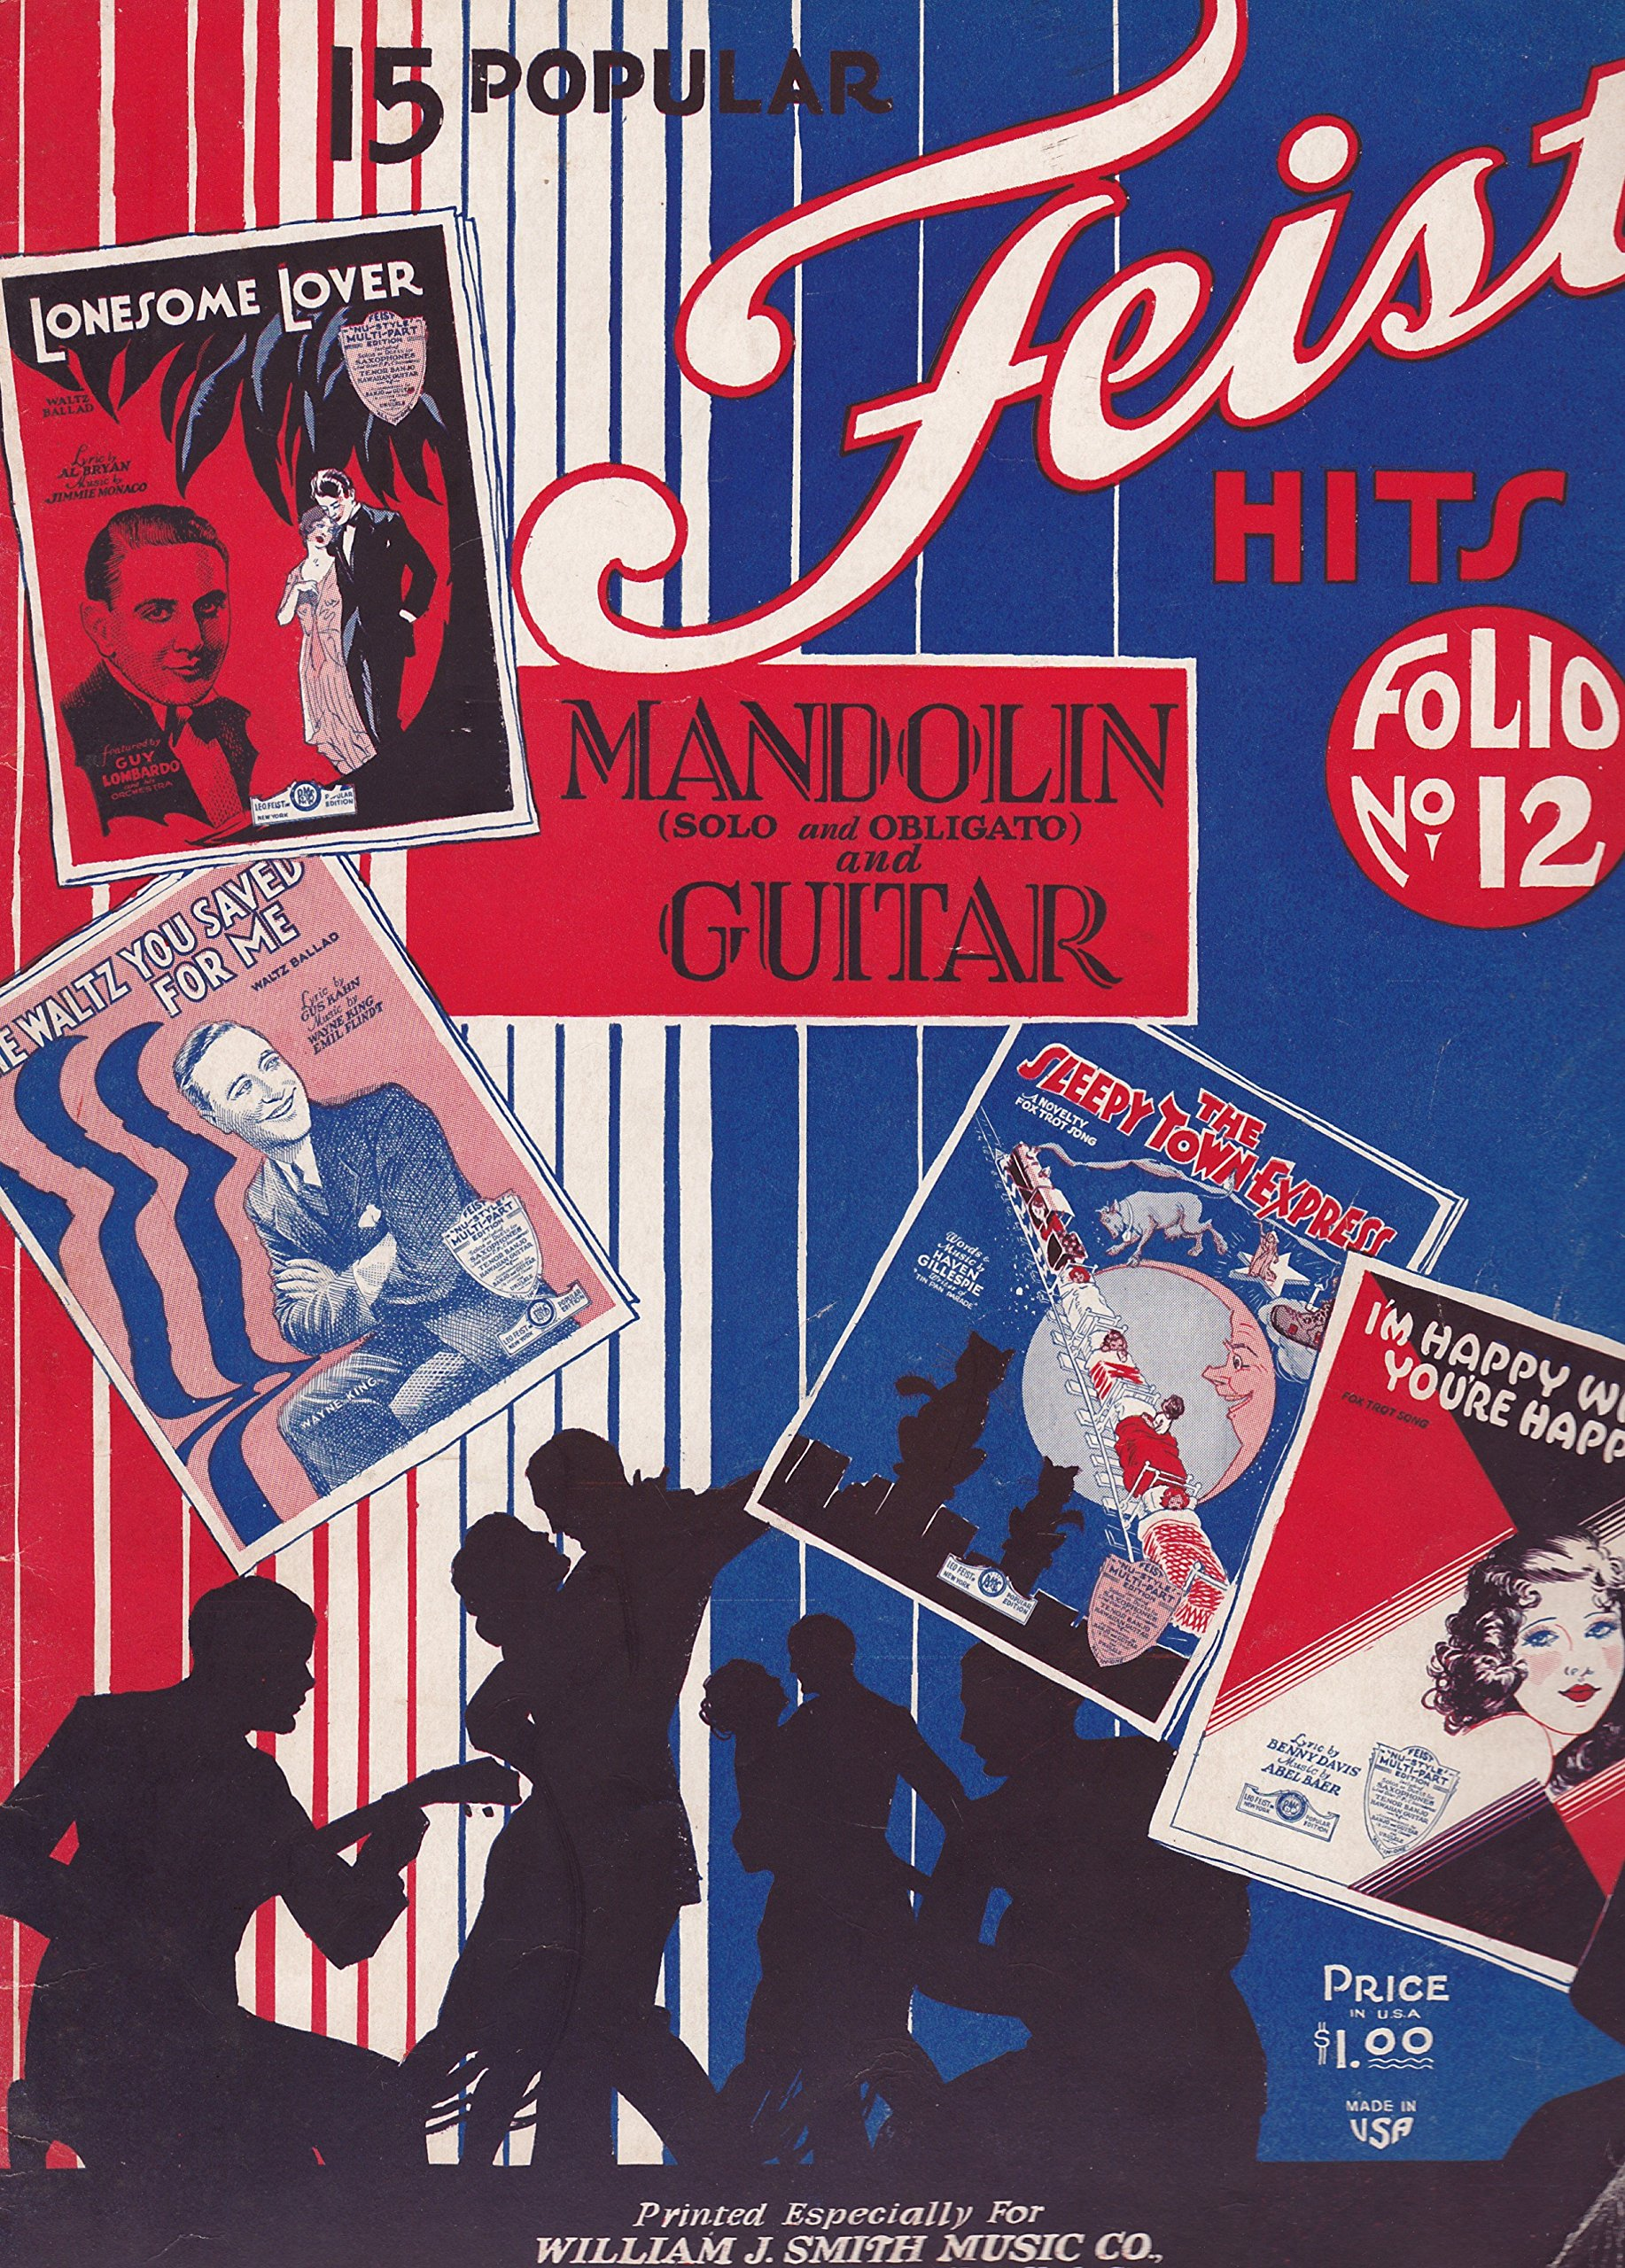 15 Popular Feist Hits [Mandolin and Guitar]